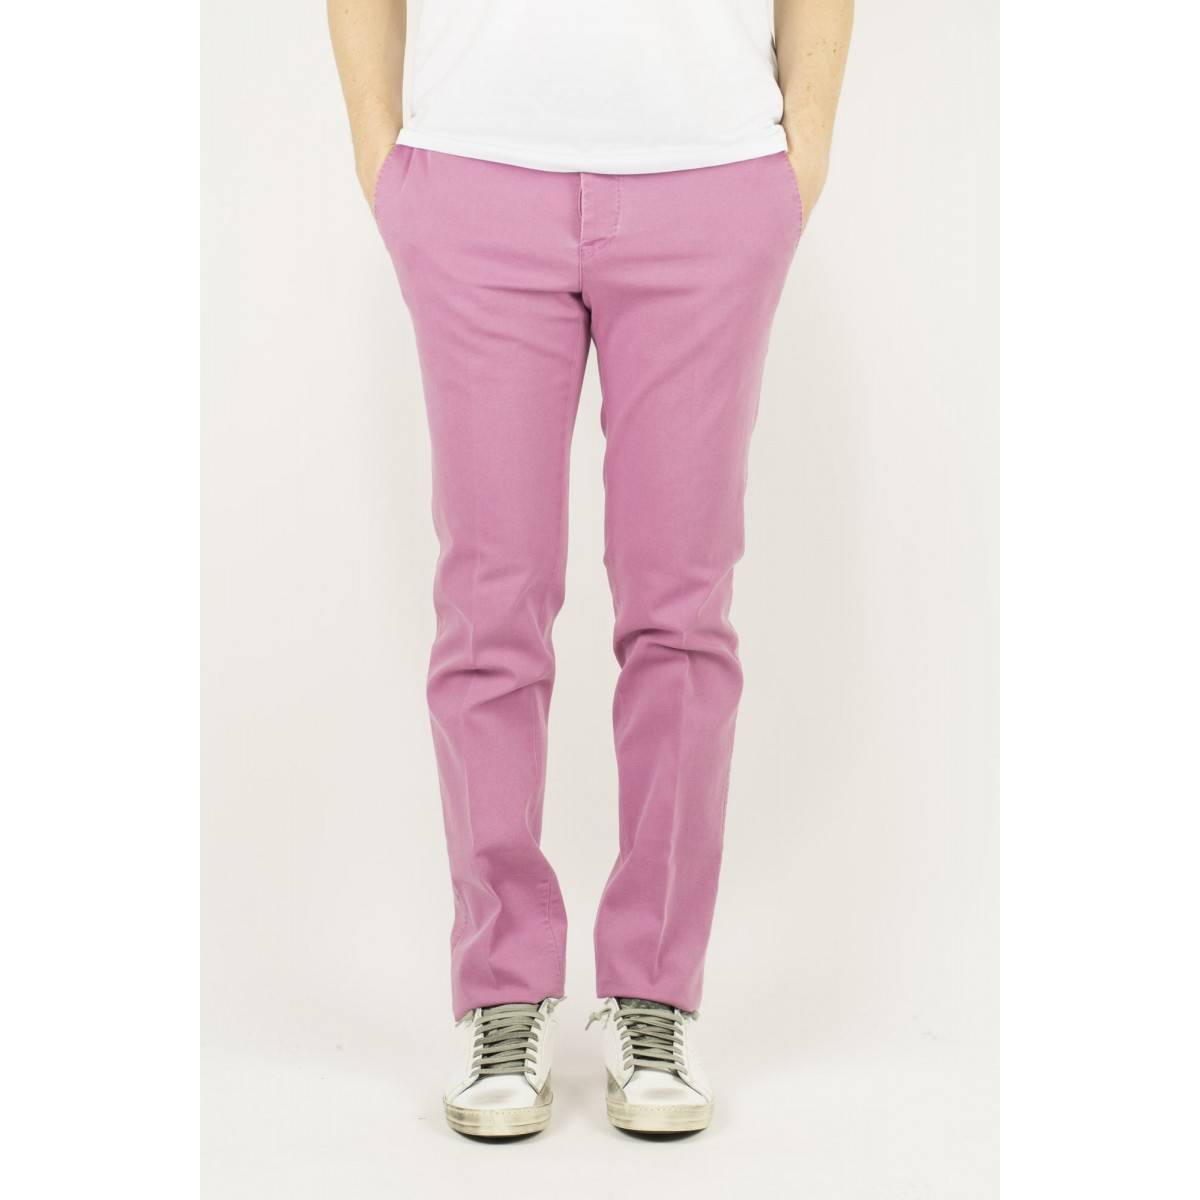 Pantalone Pt 01 Uomo - Cpvlsb Sr50 0600